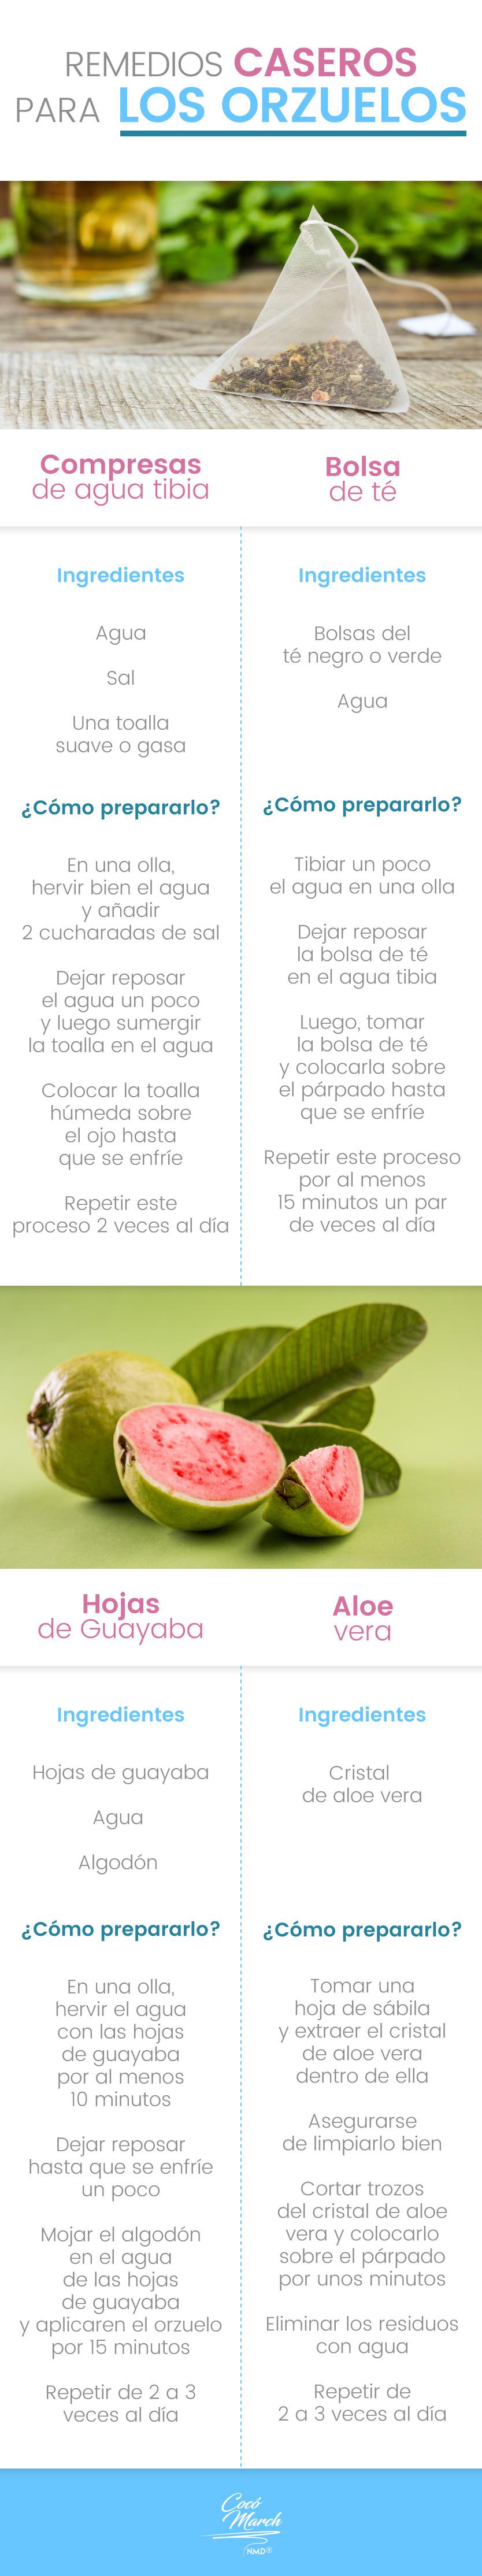 orzuelos-remedios-caseros